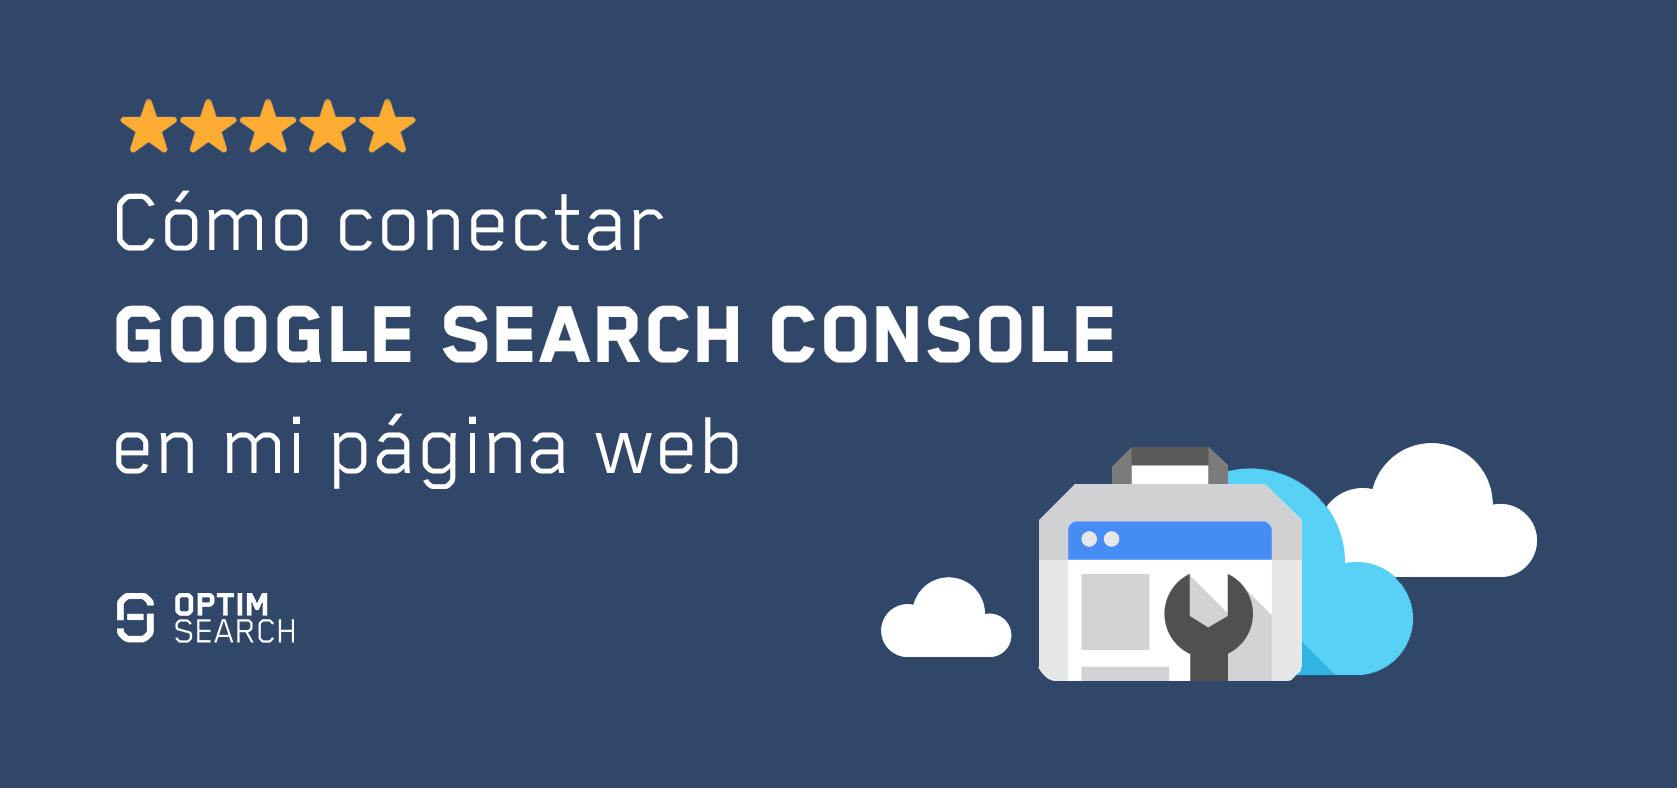 google search console conectar